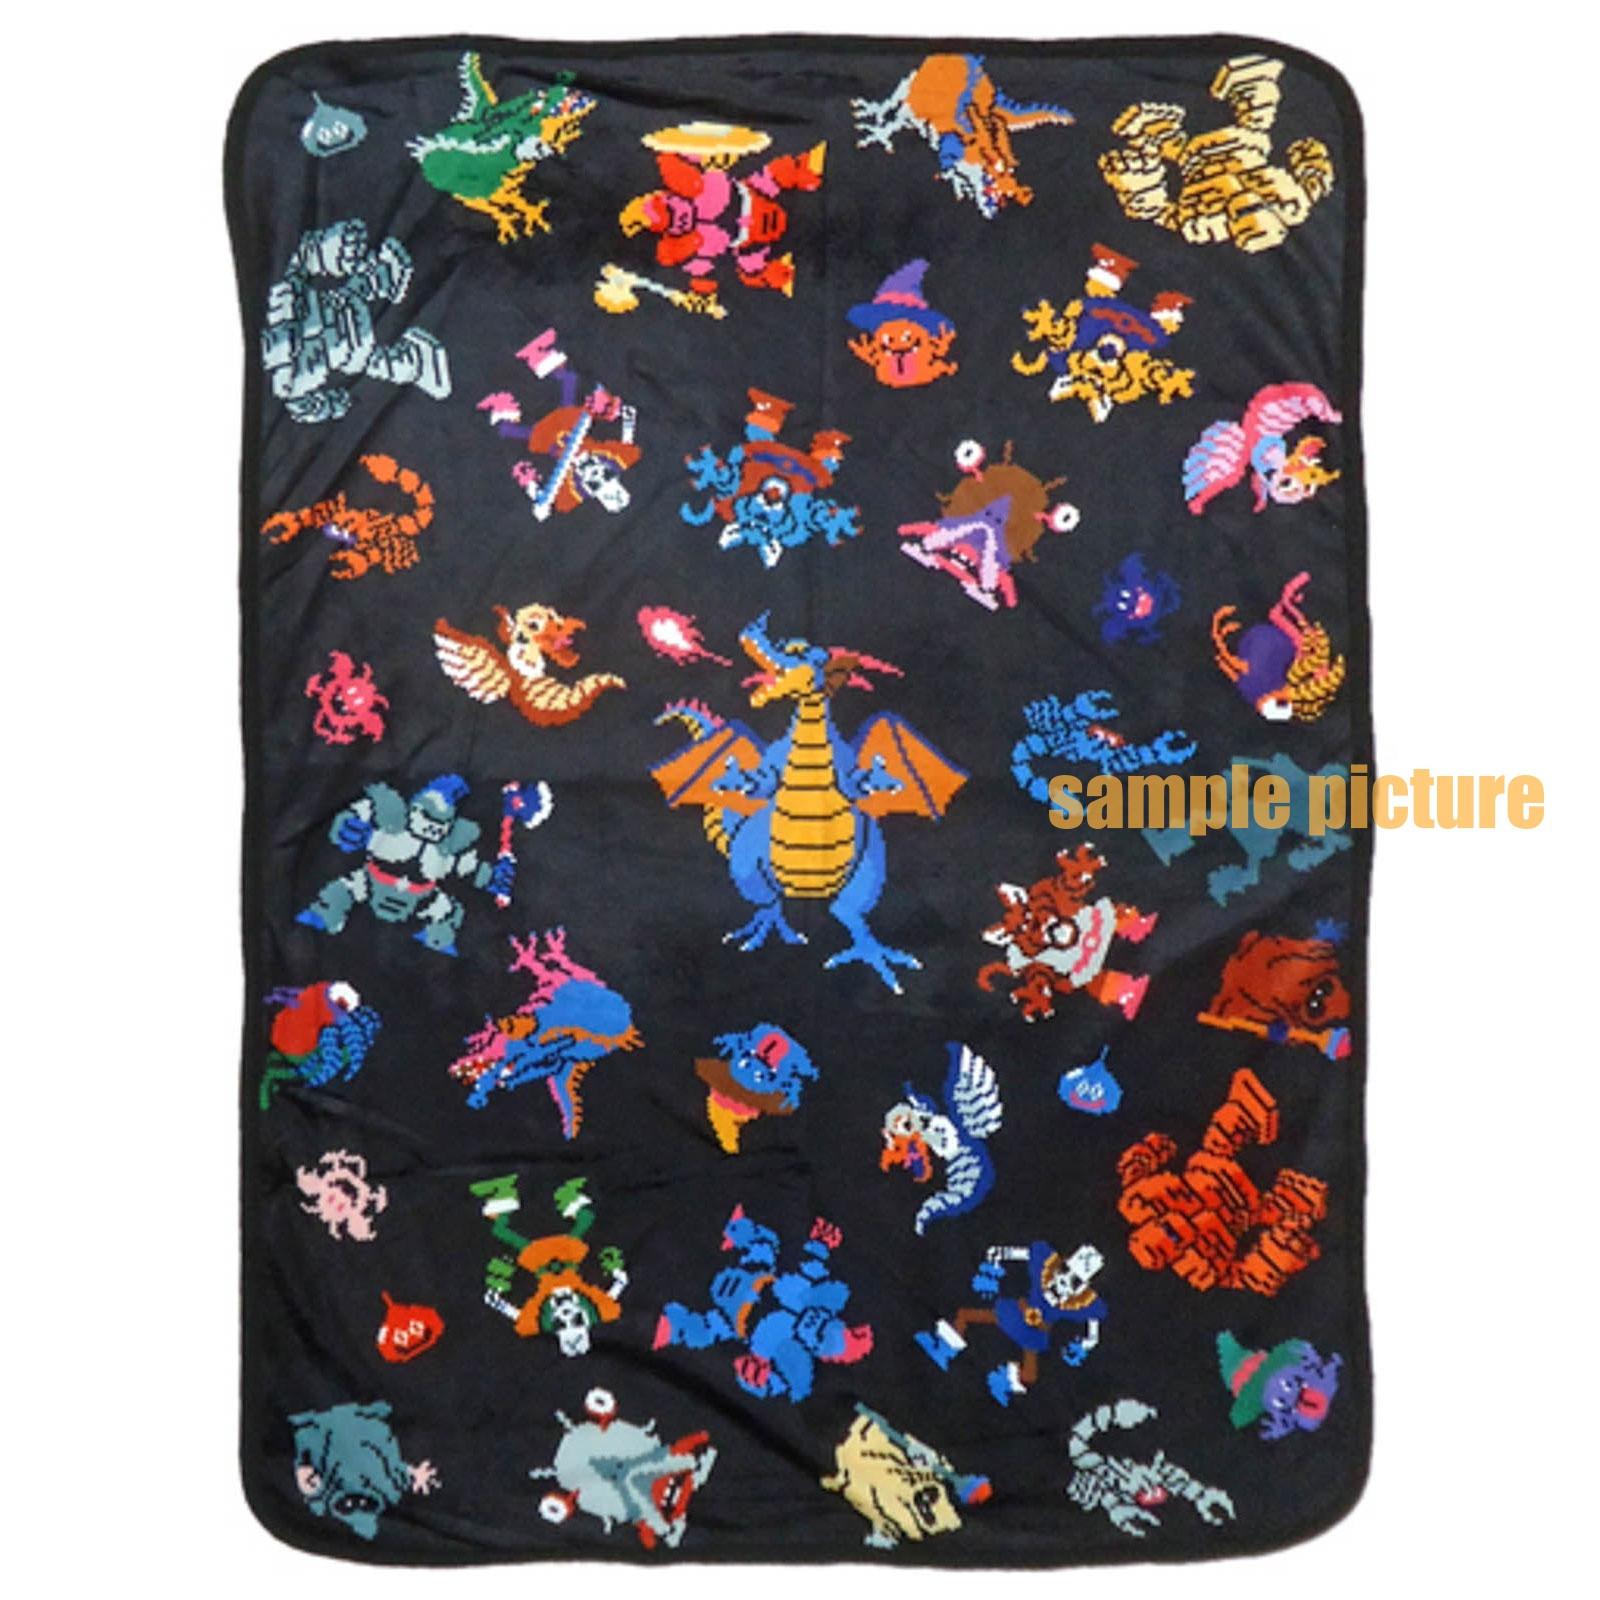 Dragon Quest Dot Monsters blanket 100x70cm Square Enix JAPAN GAME